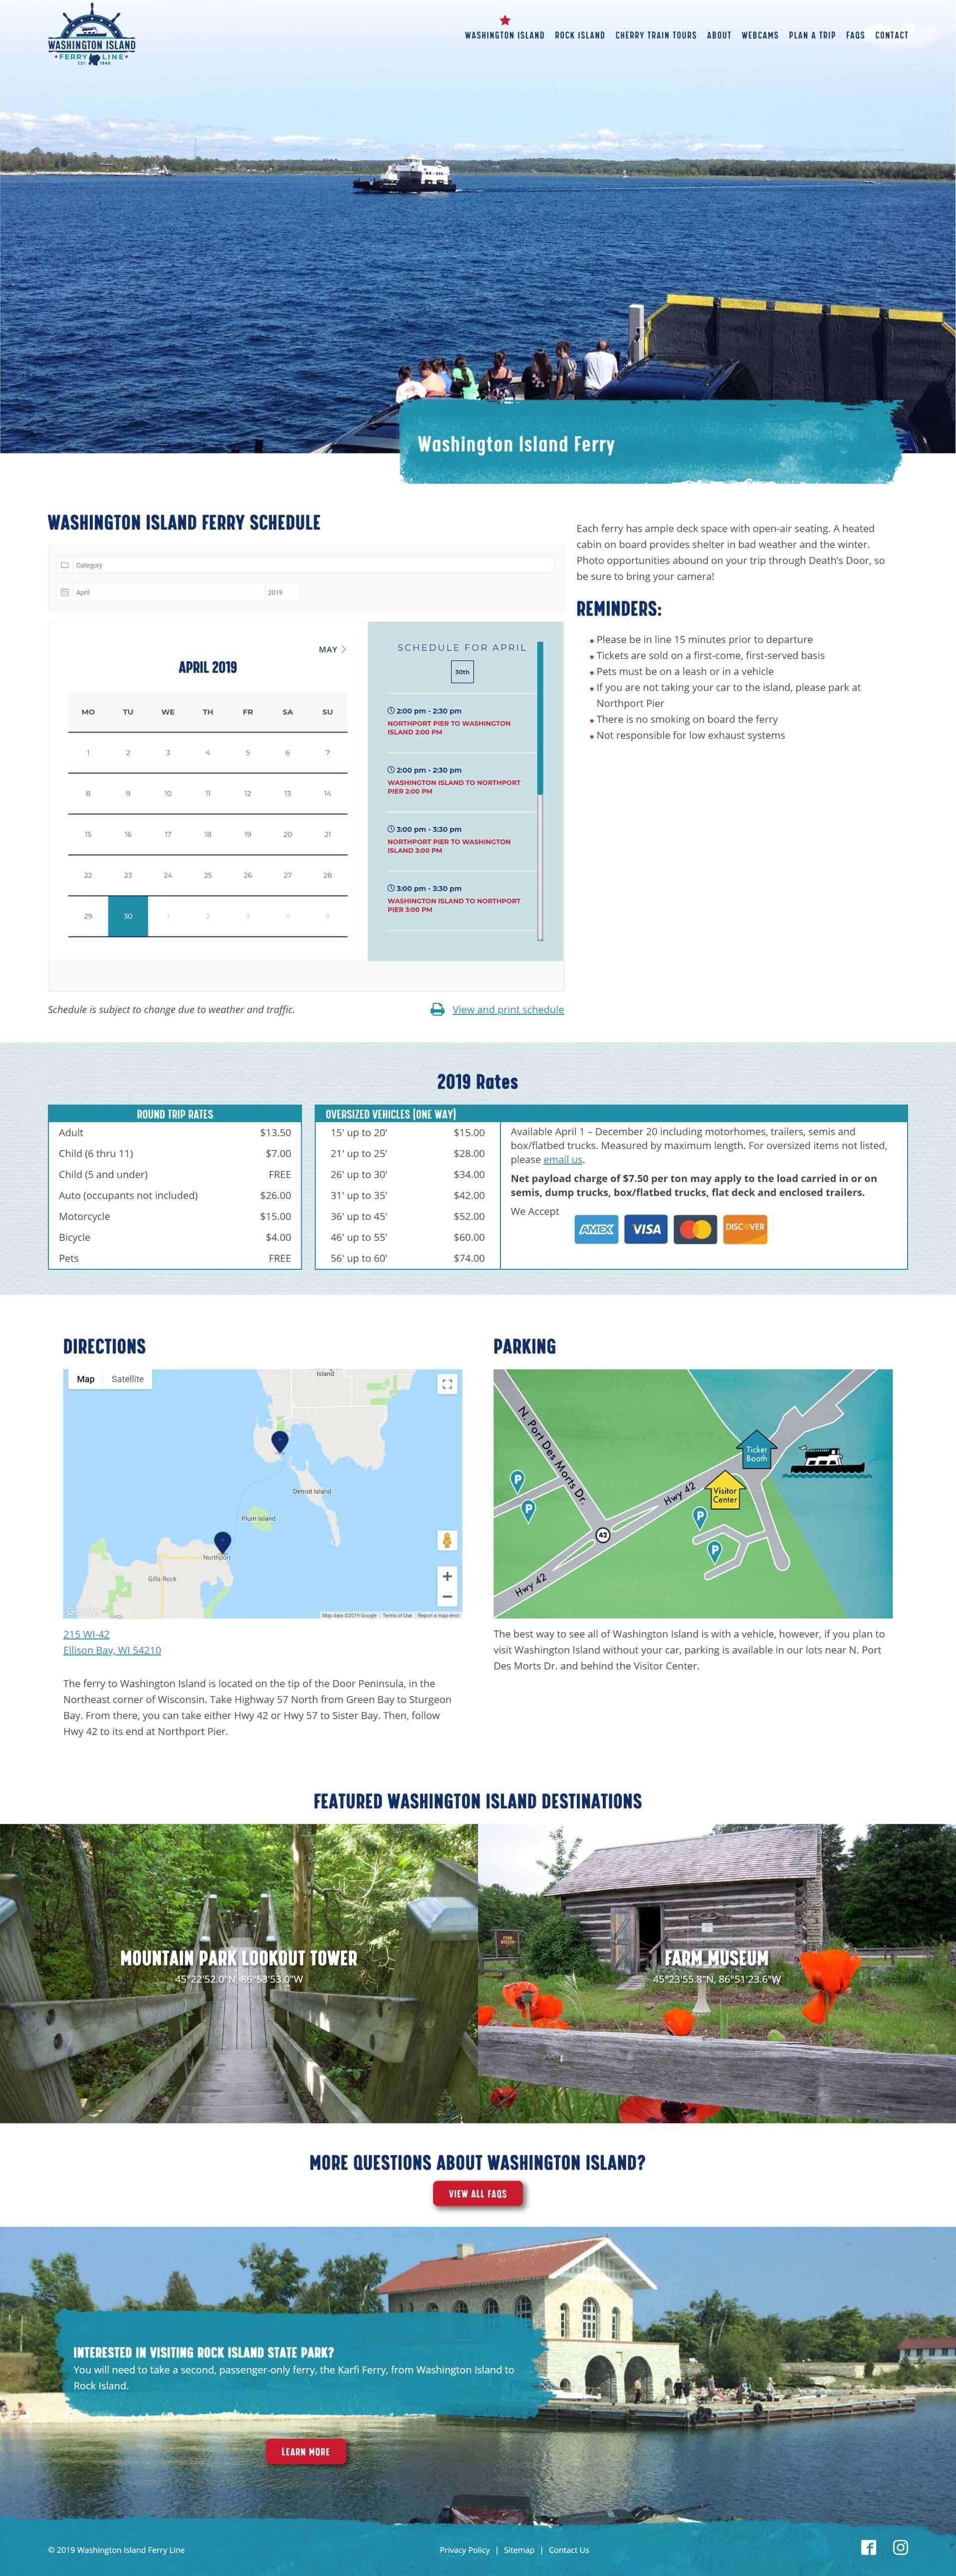 New Washington Island Page